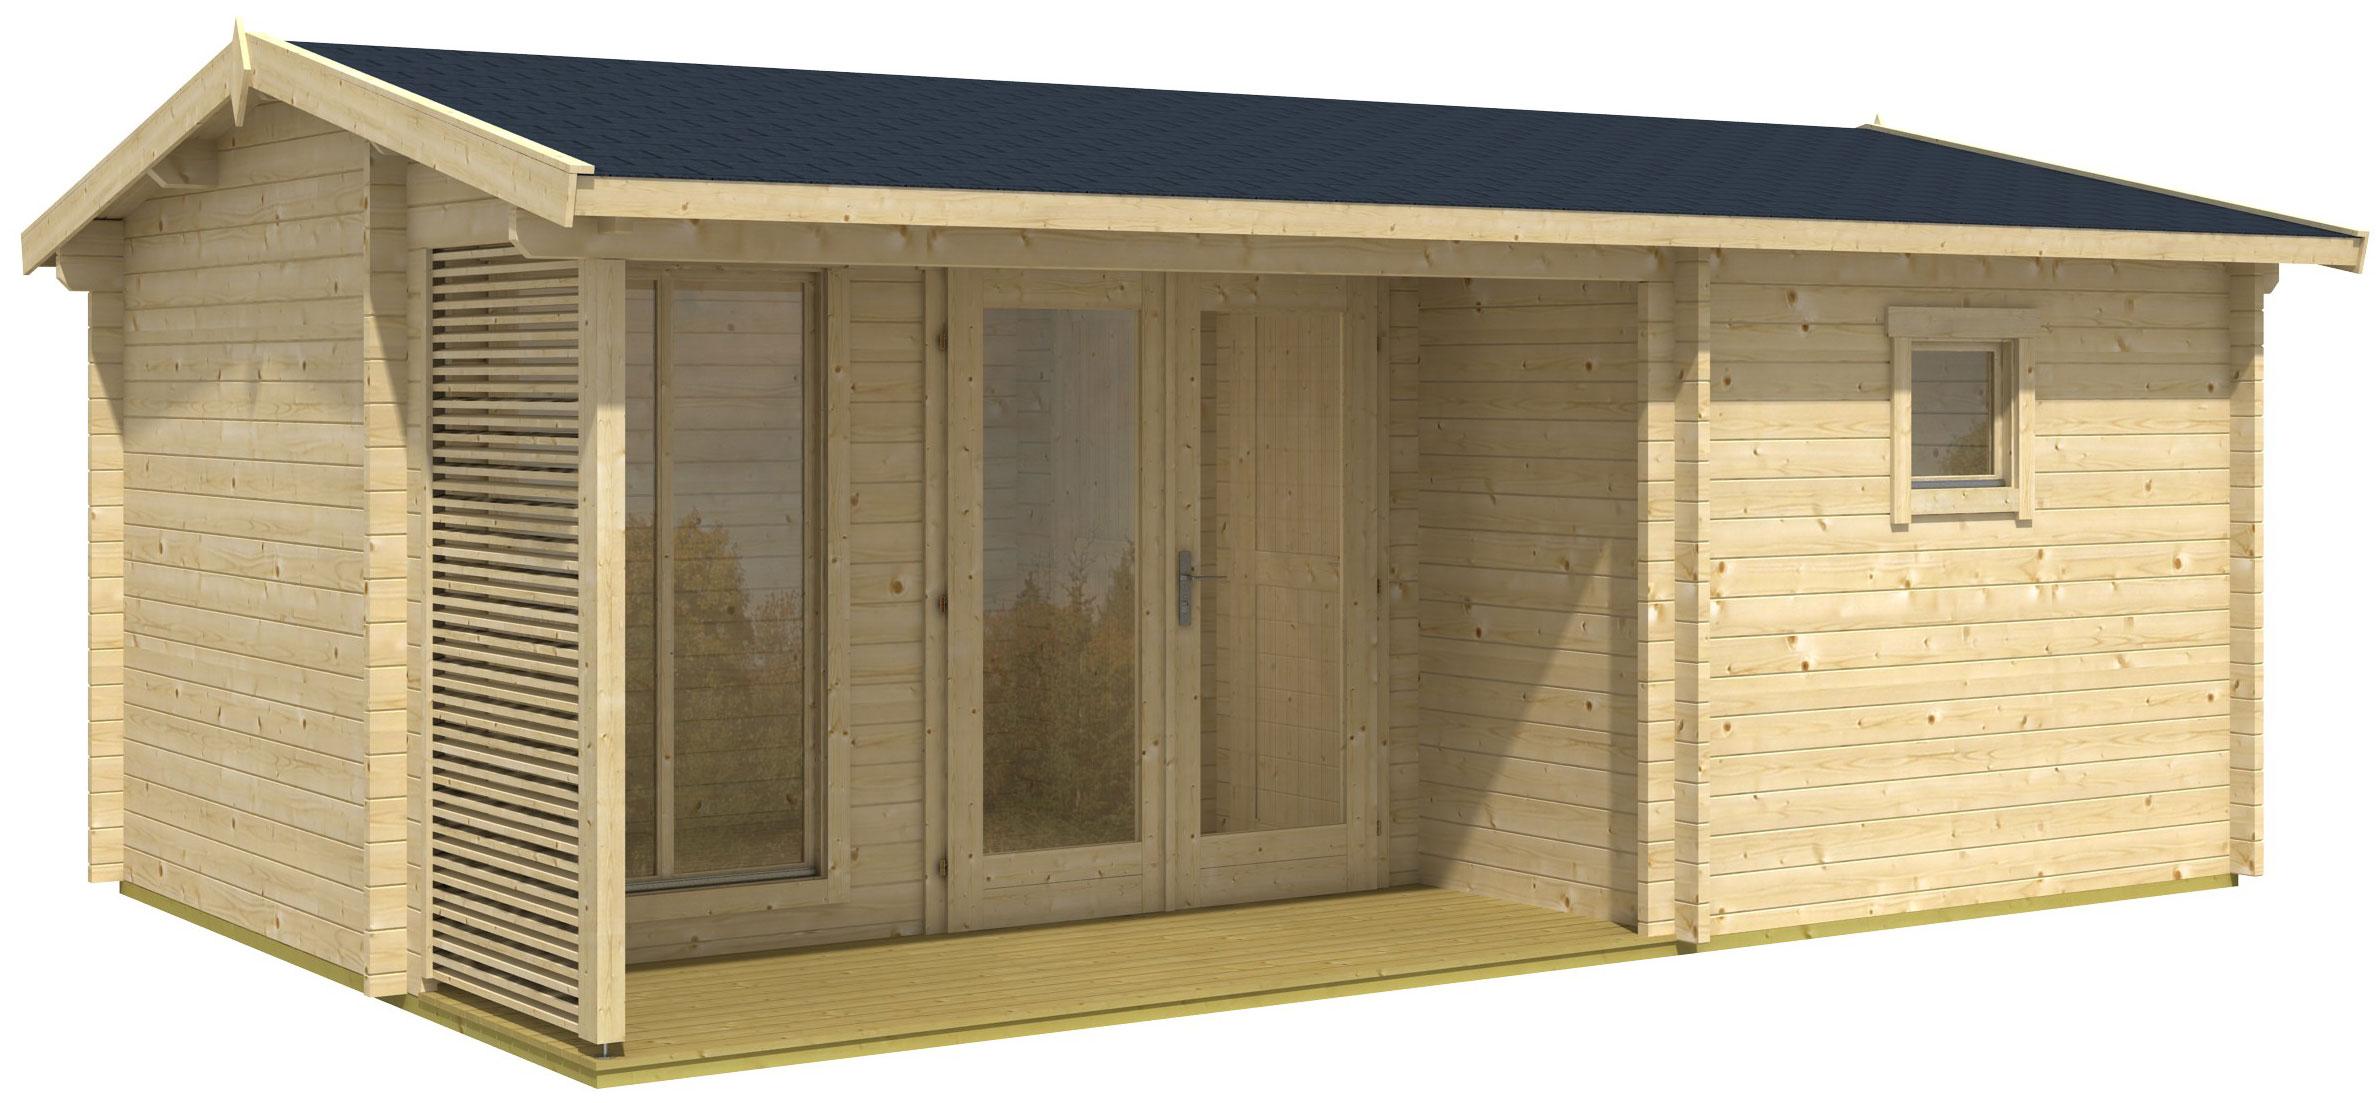 gartenhaus dundee online g nstig kaufen. Black Bedroom Furniture Sets. Home Design Ideas